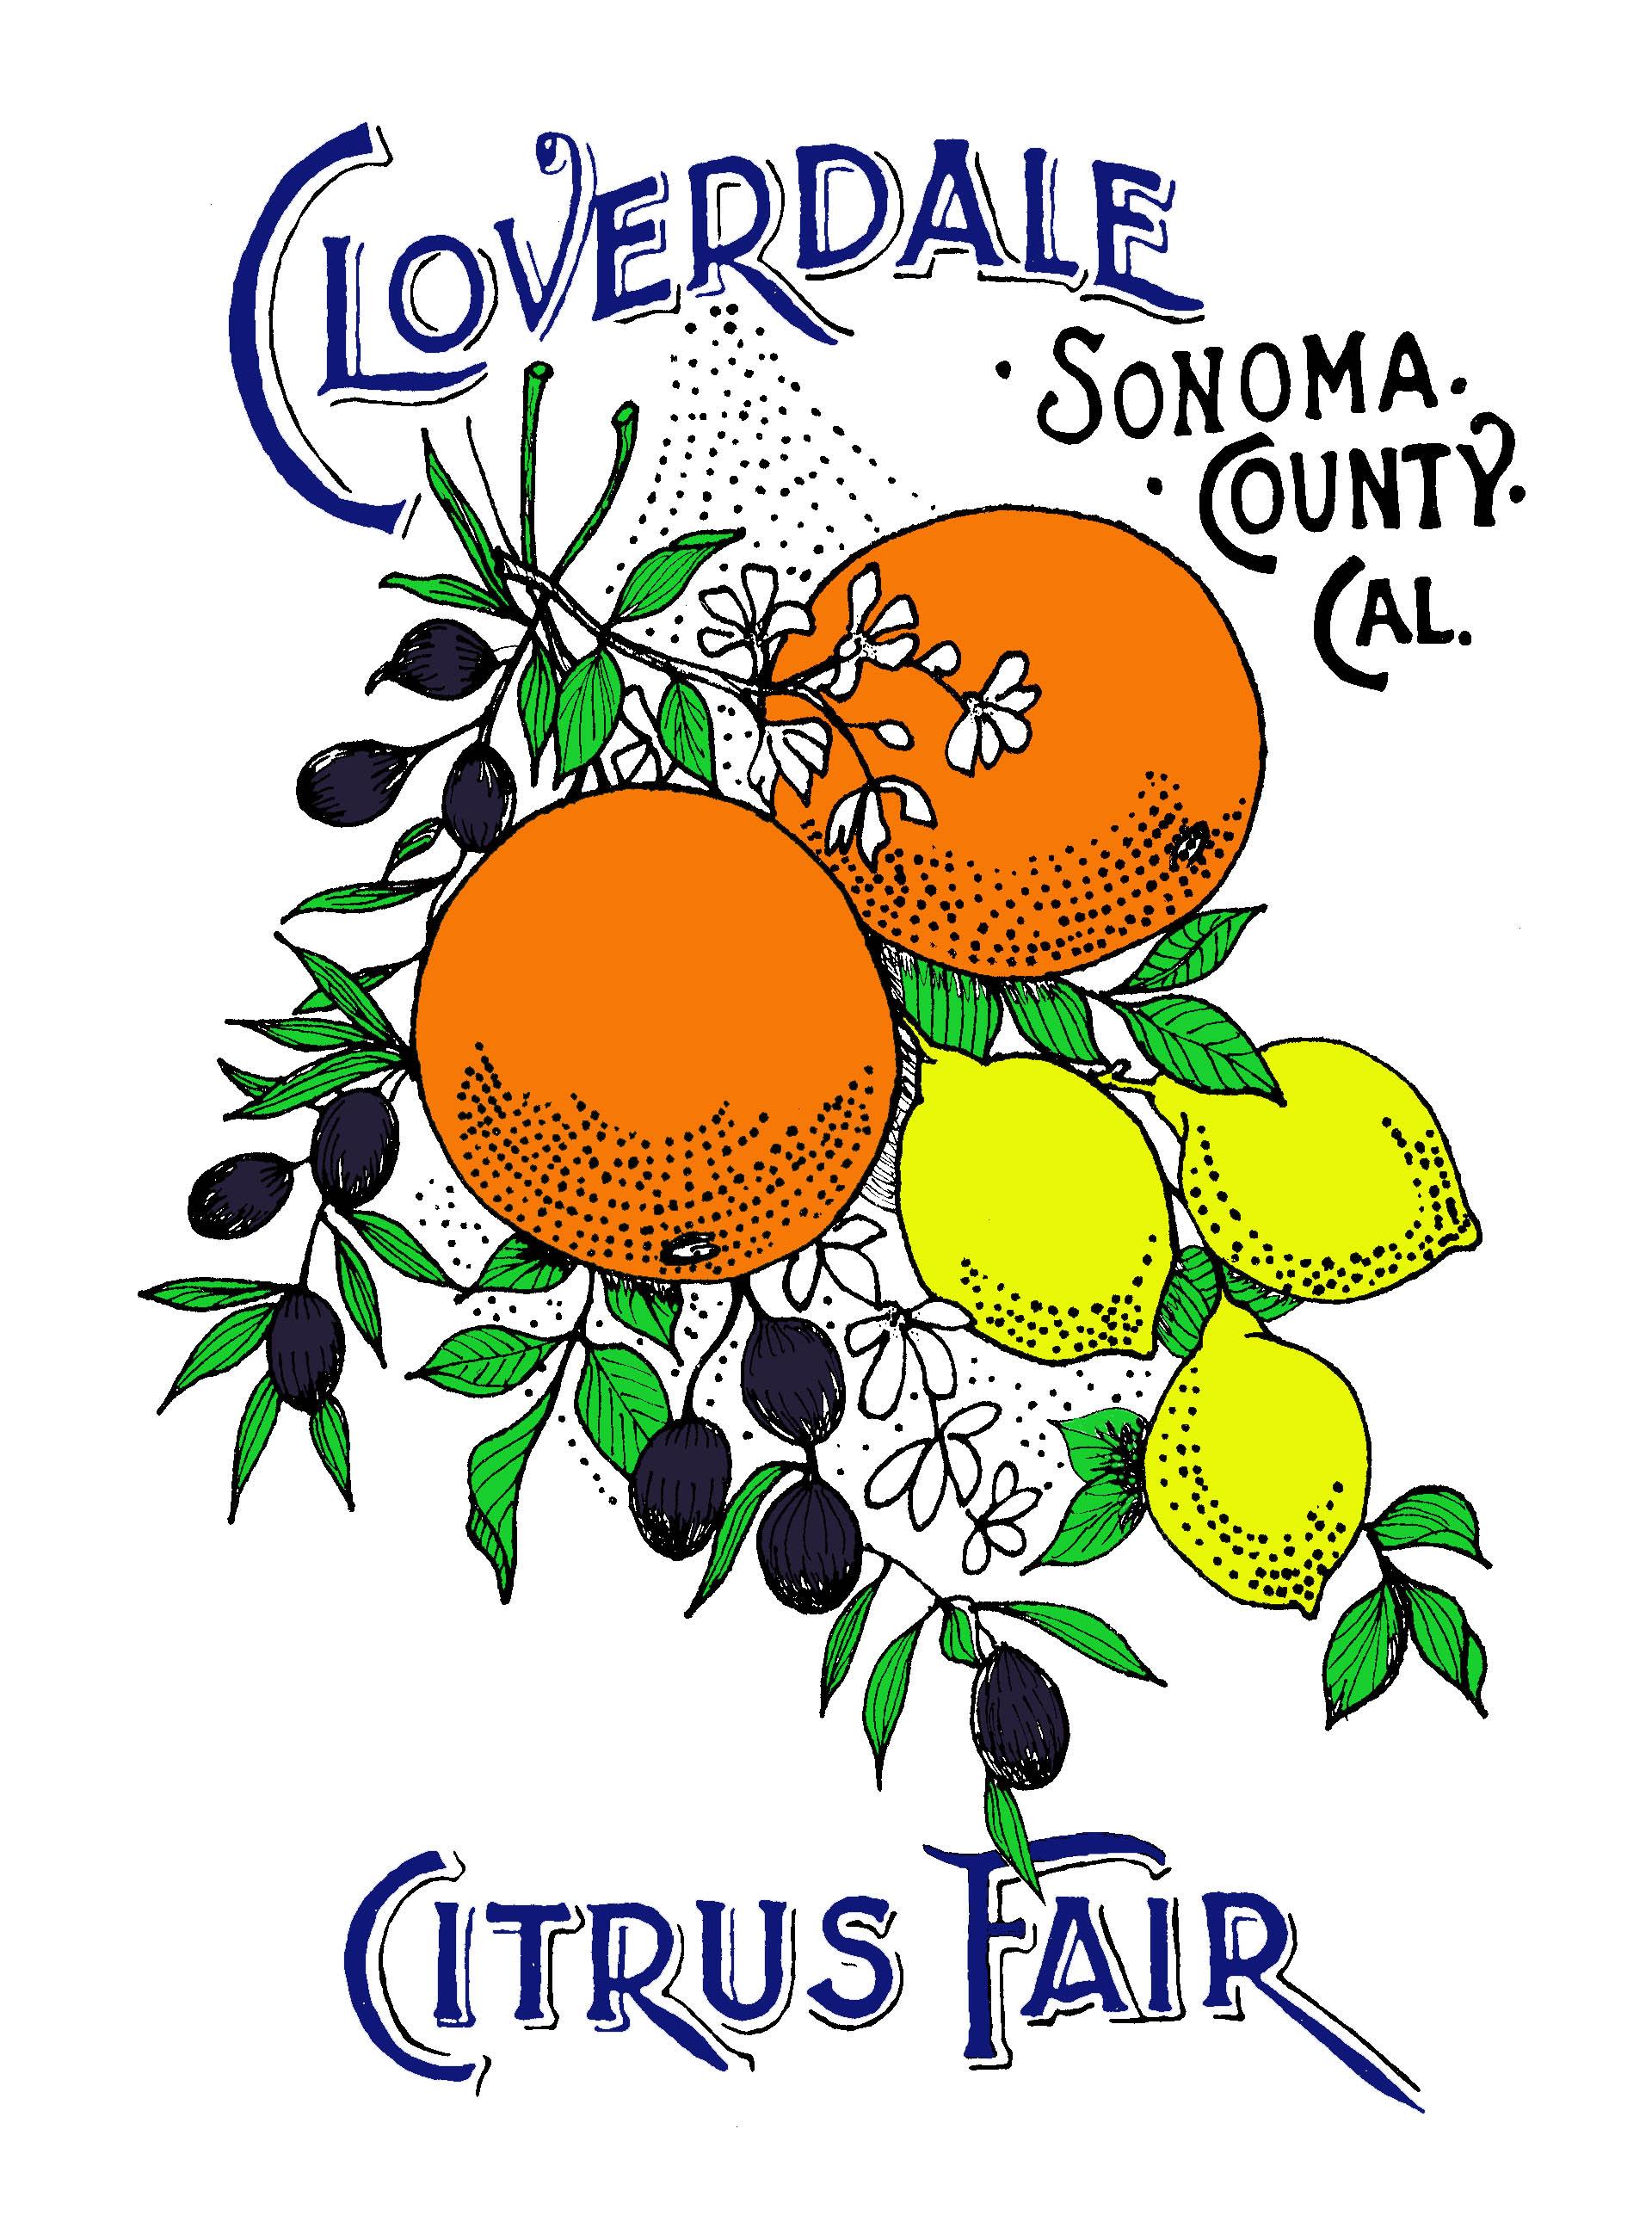 Citrus Fair Logo new.jpg